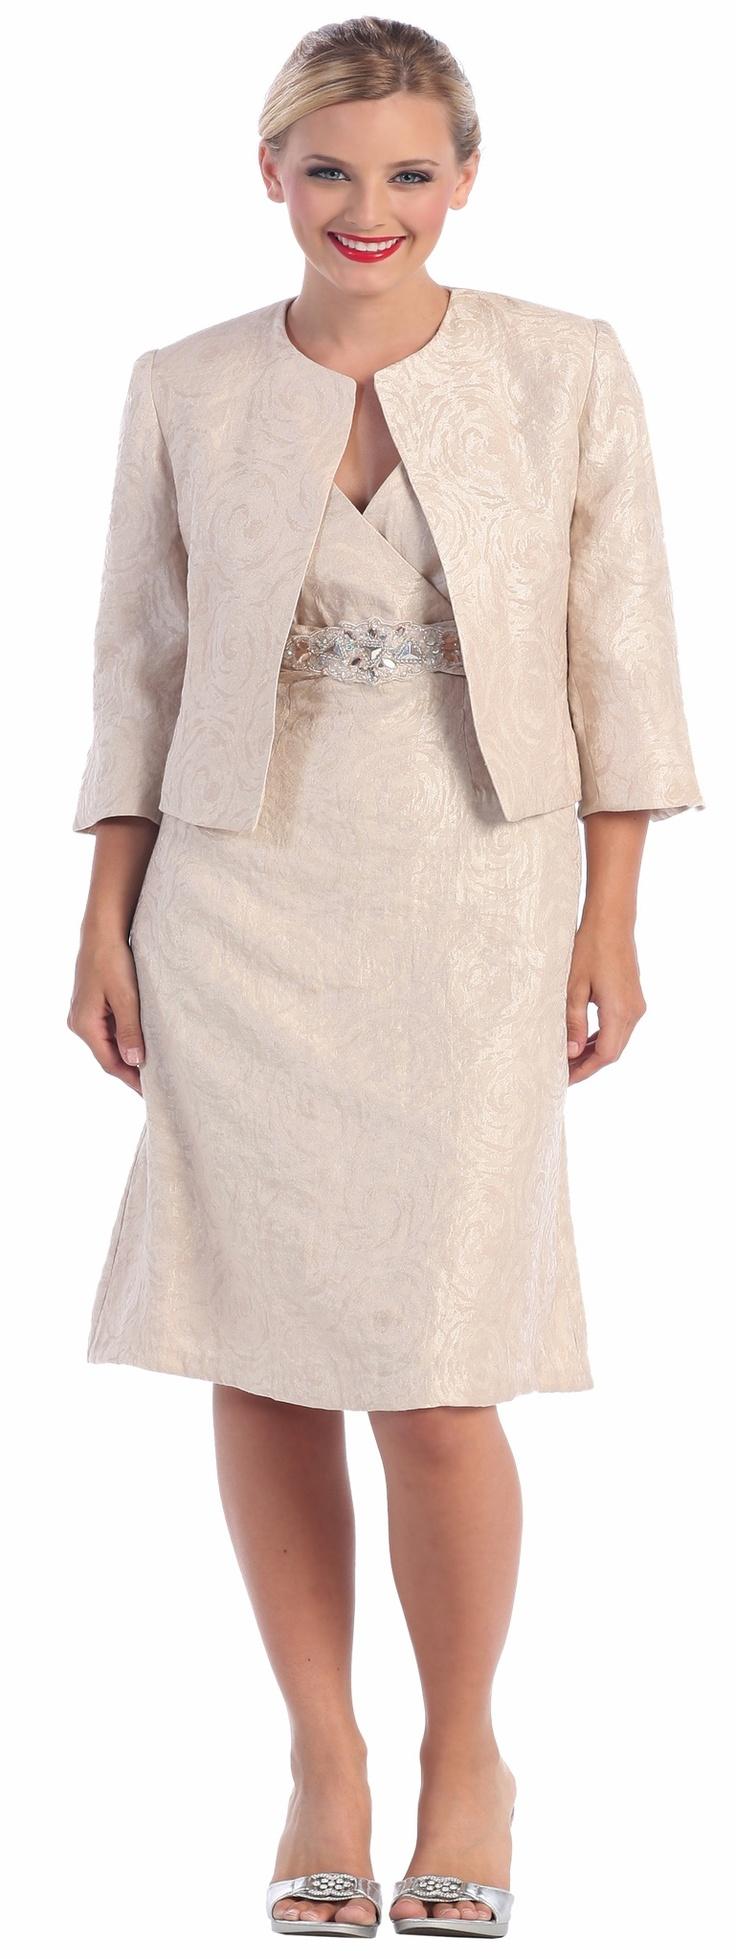 Mid length dresses for wedding guests   best Wedding images on Pinterest  Mob dresses Plus size dresses